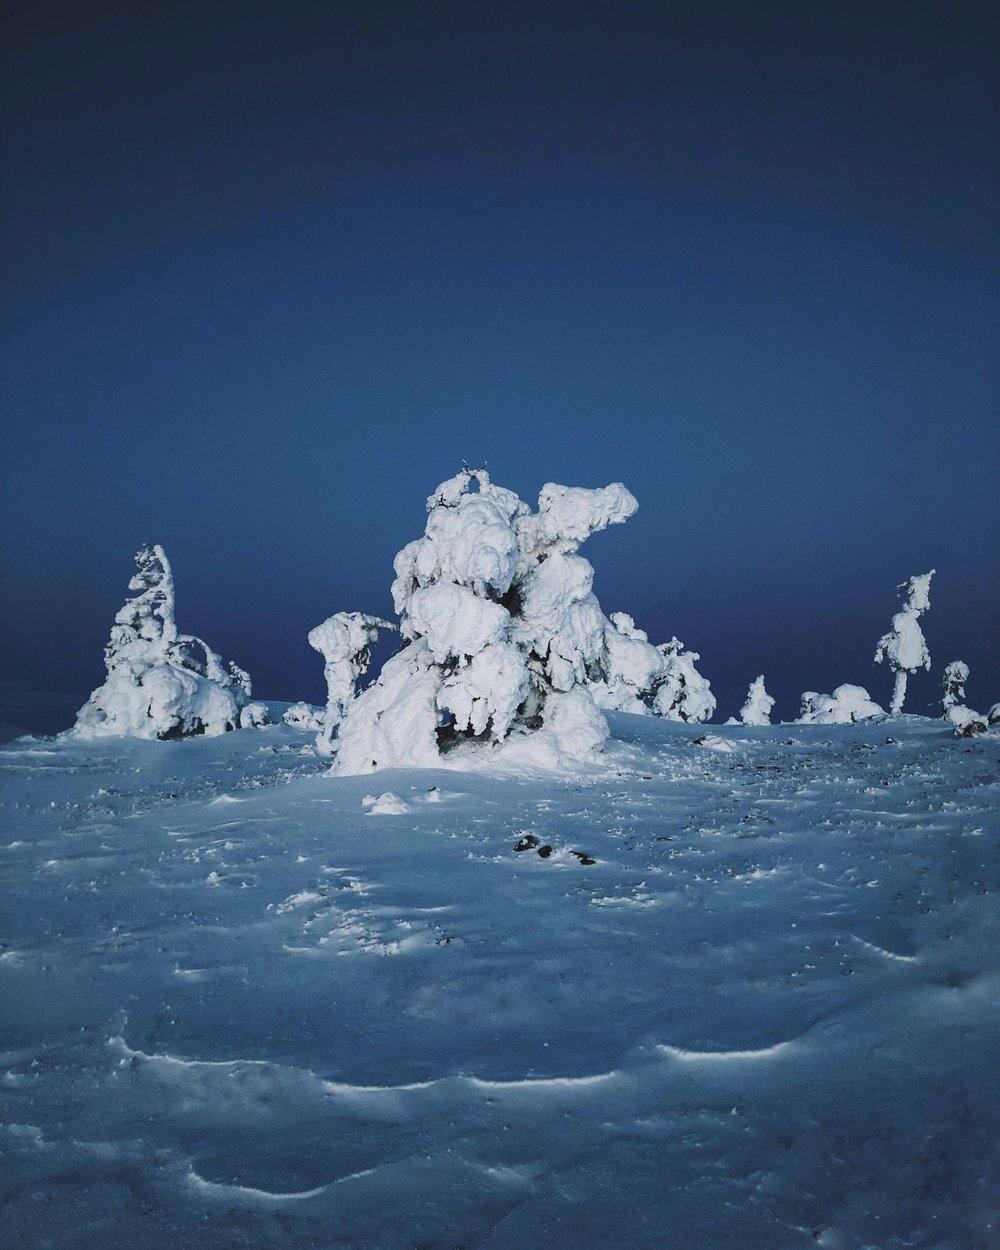 henrik.samuel.winter.levilapland-2.jpg